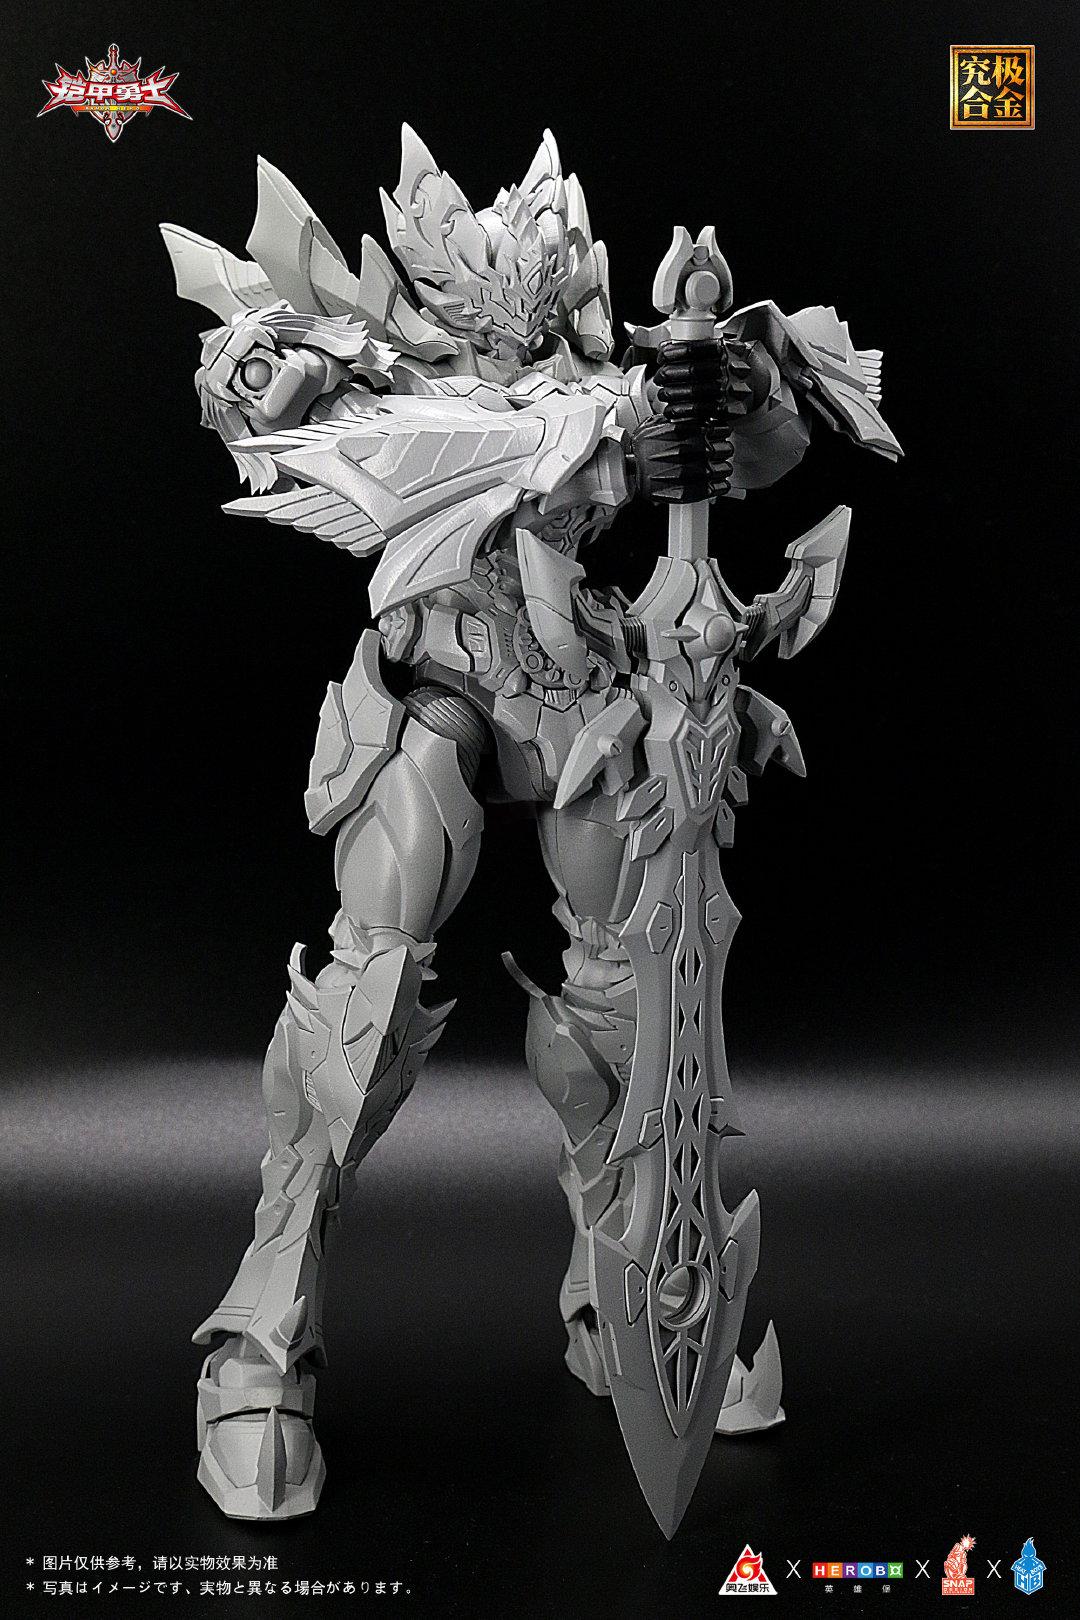 S535_Armor_hero_Emperor_018.jpg